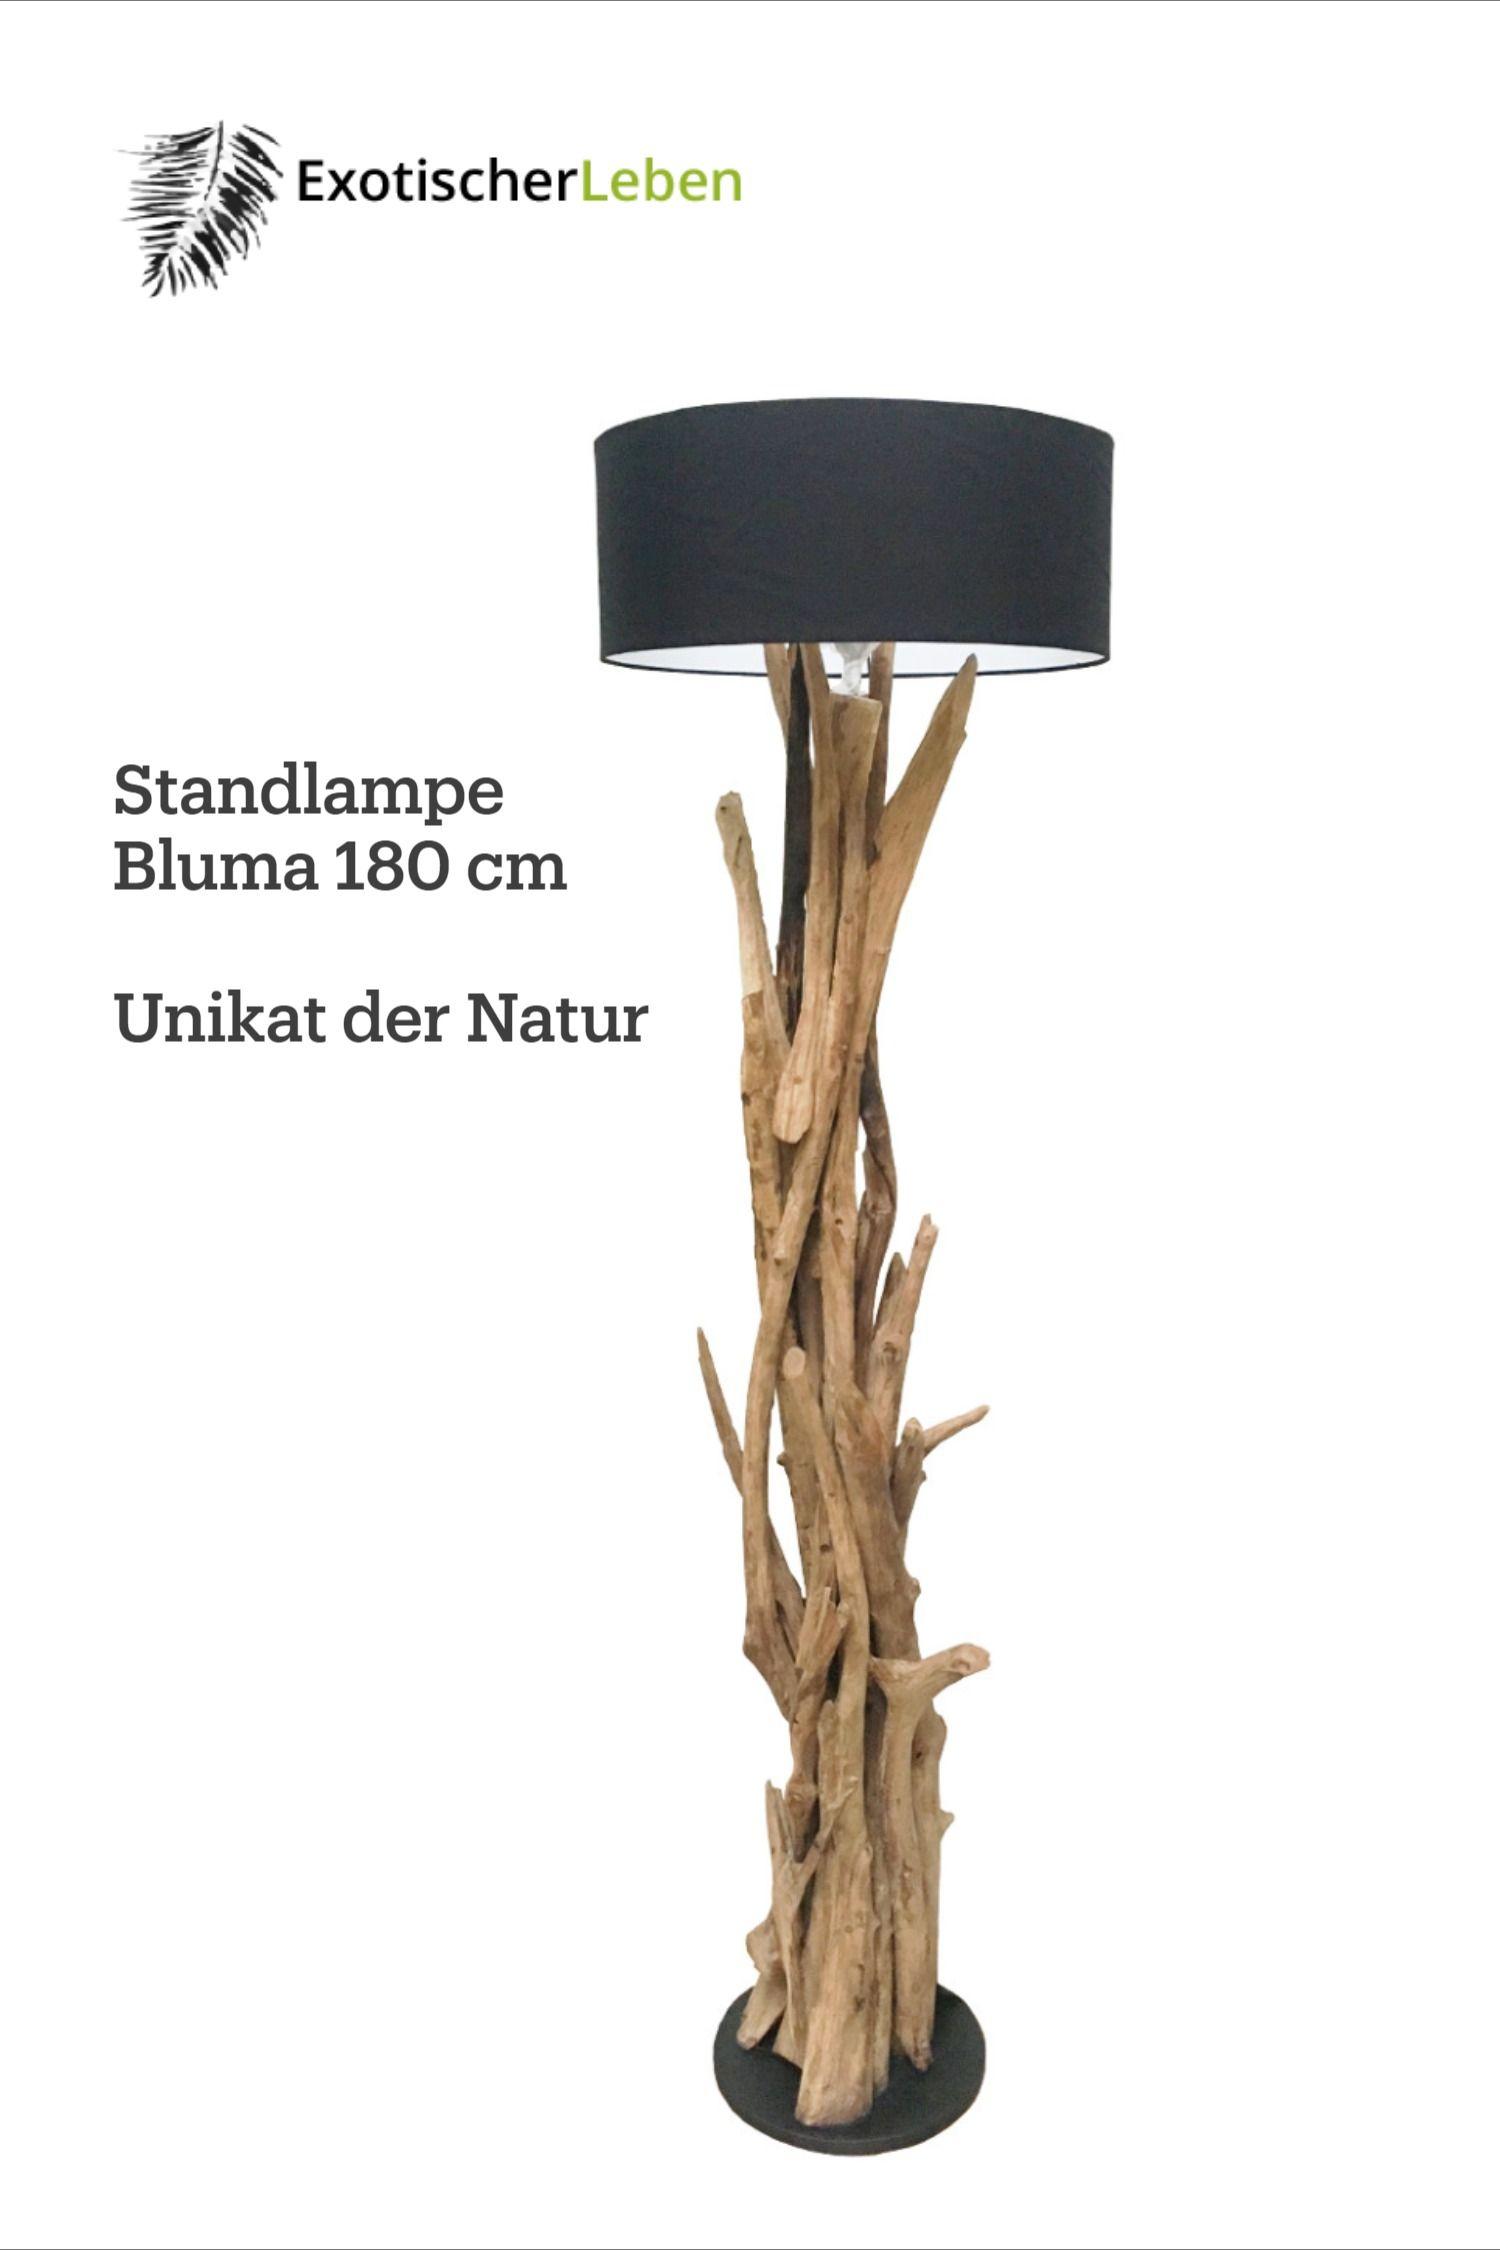 Natur Standlampe Bluma 6 cm aus Teak Wurzelholz in 6  Lampe